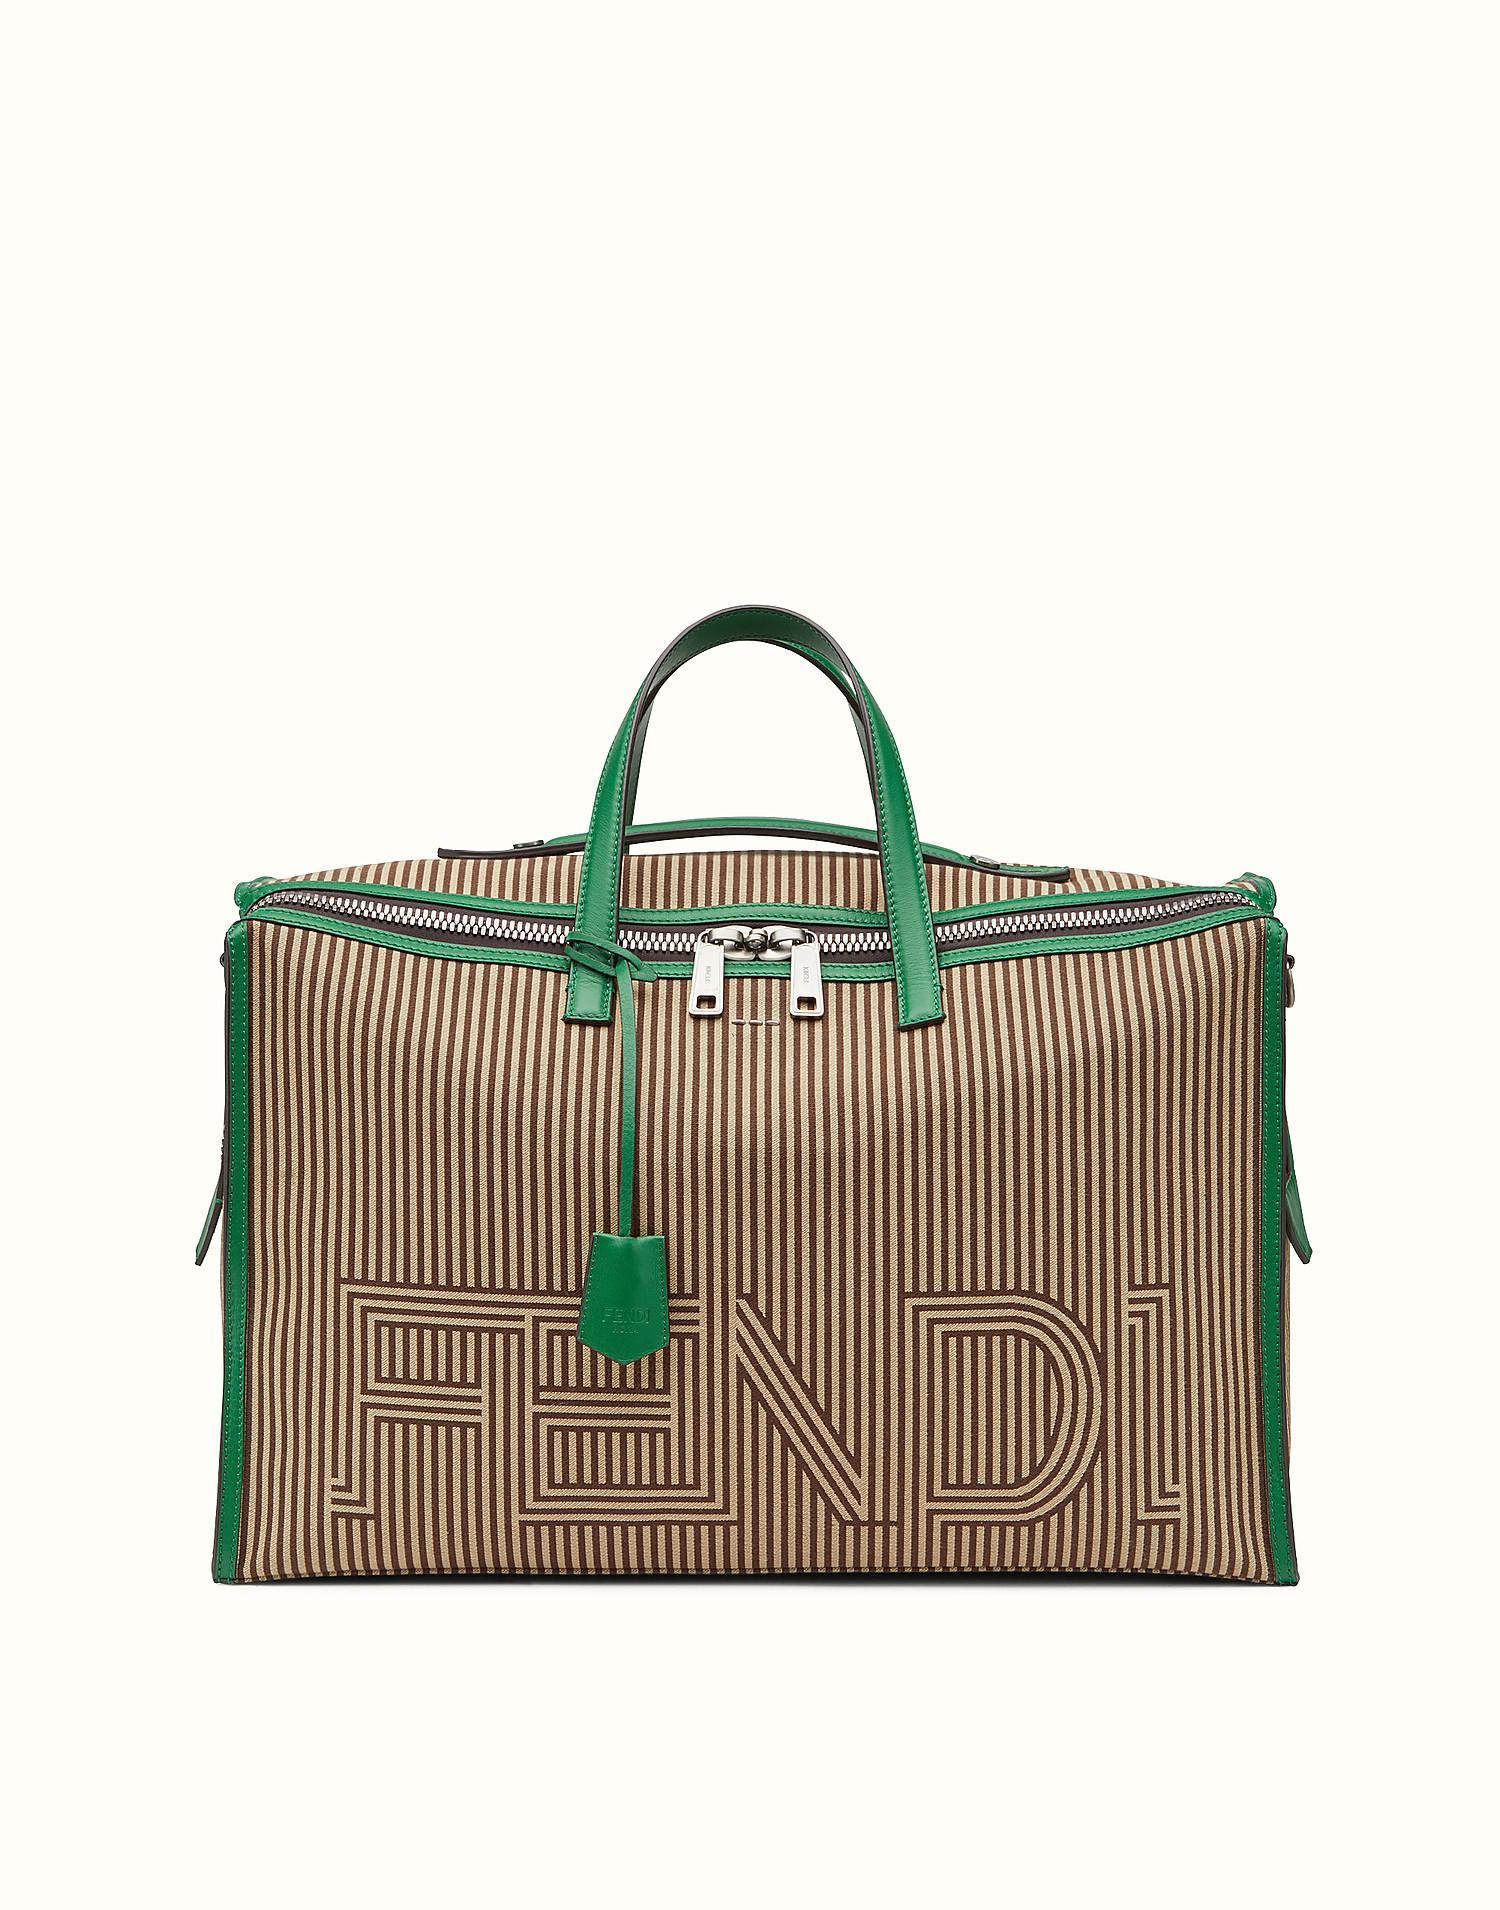 d9419313c53f Lyst fendi travel bag travel bag in green for men jpg 1500x1910 Fendi  luggage bags